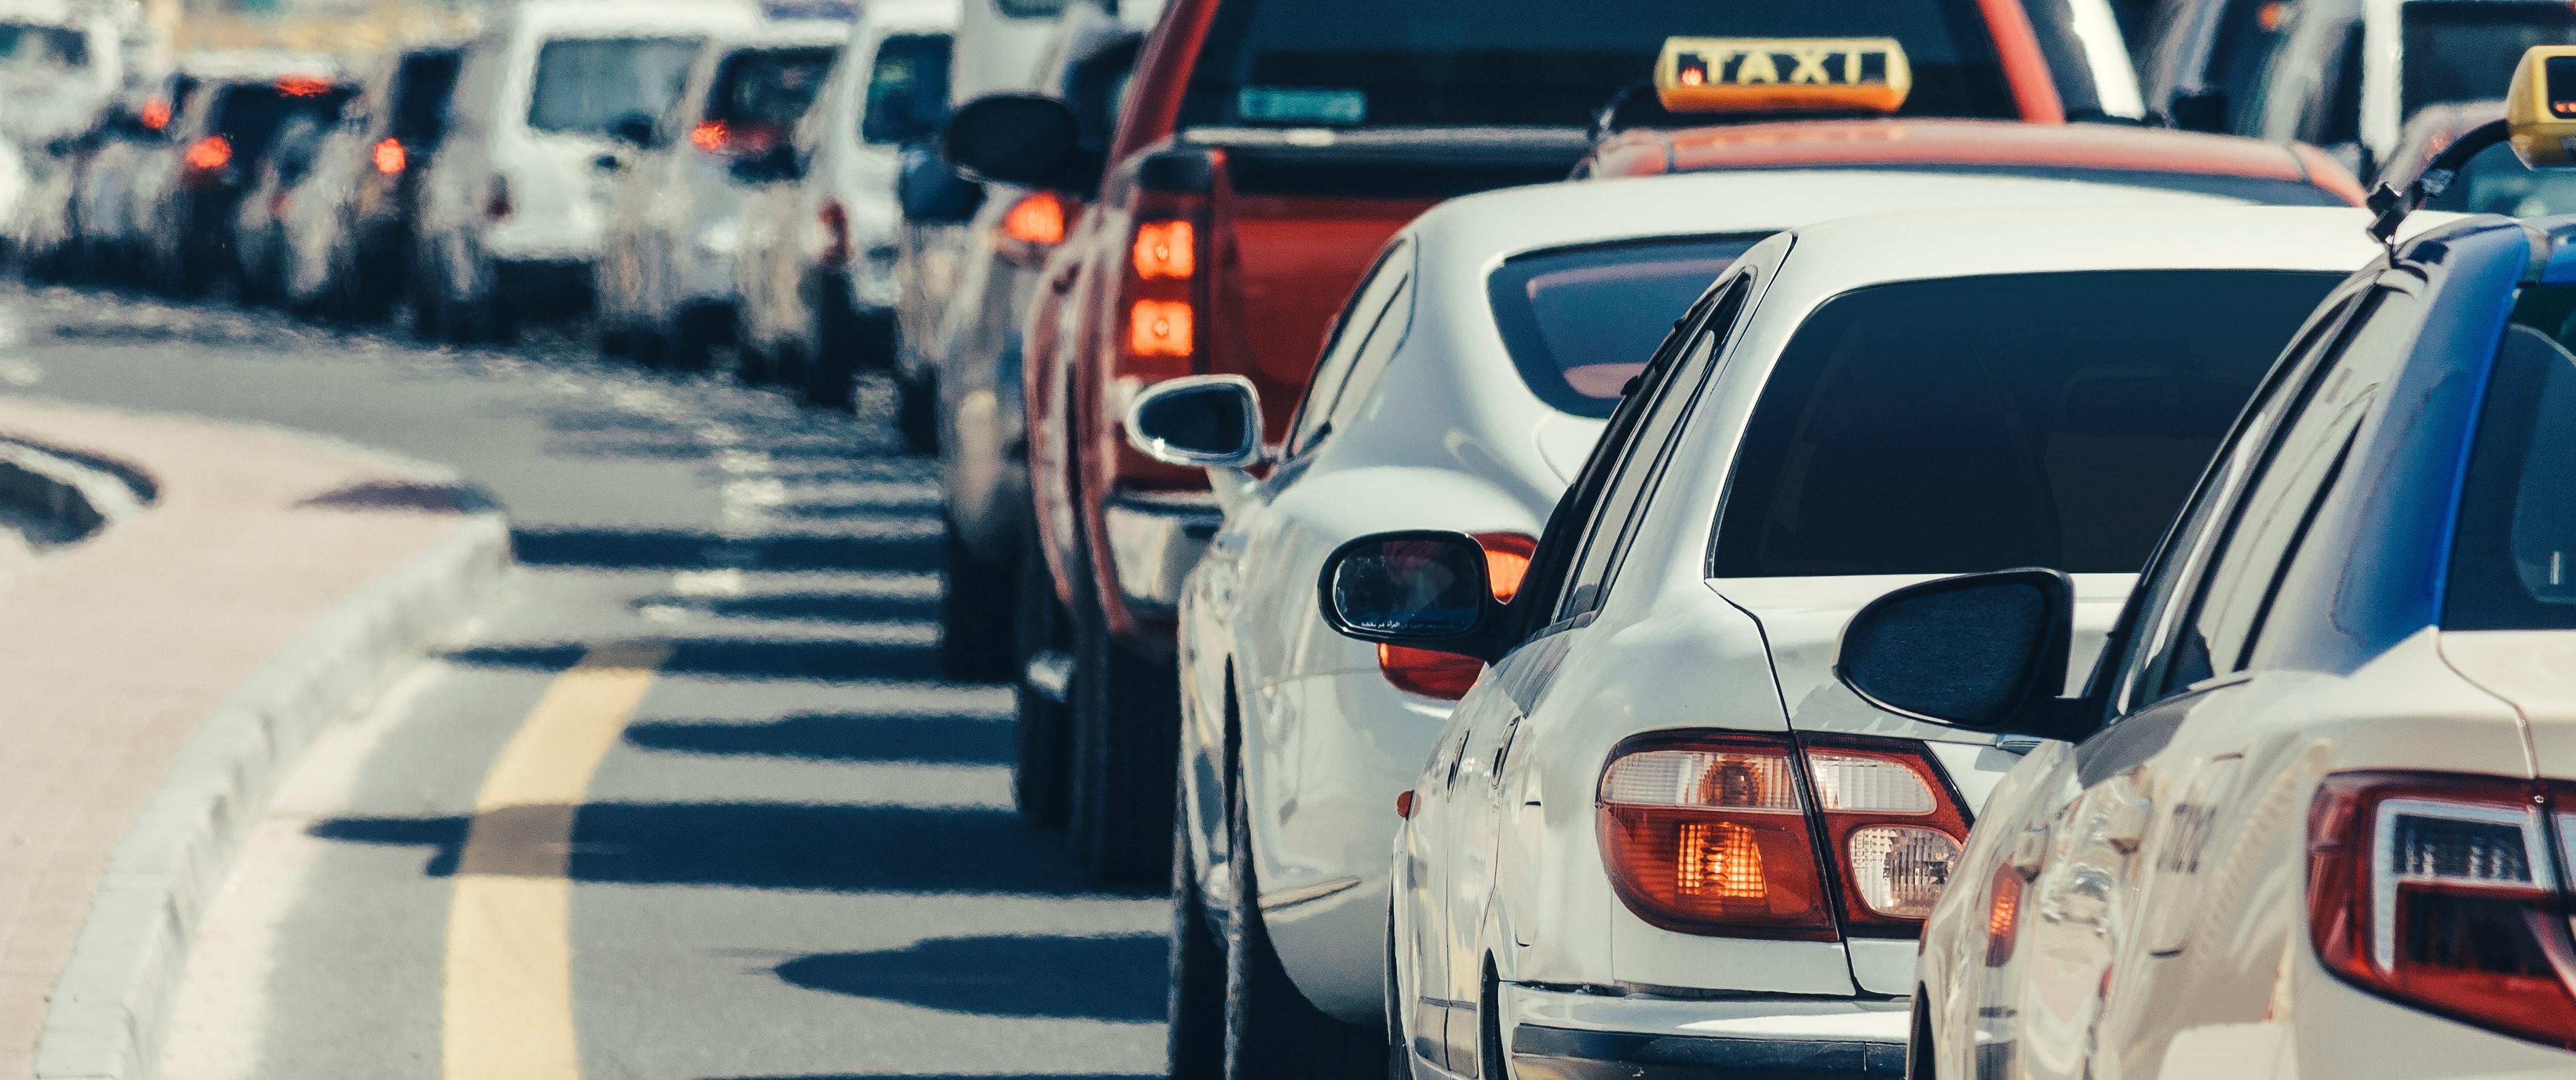 street view, traffic human transportation vehicle